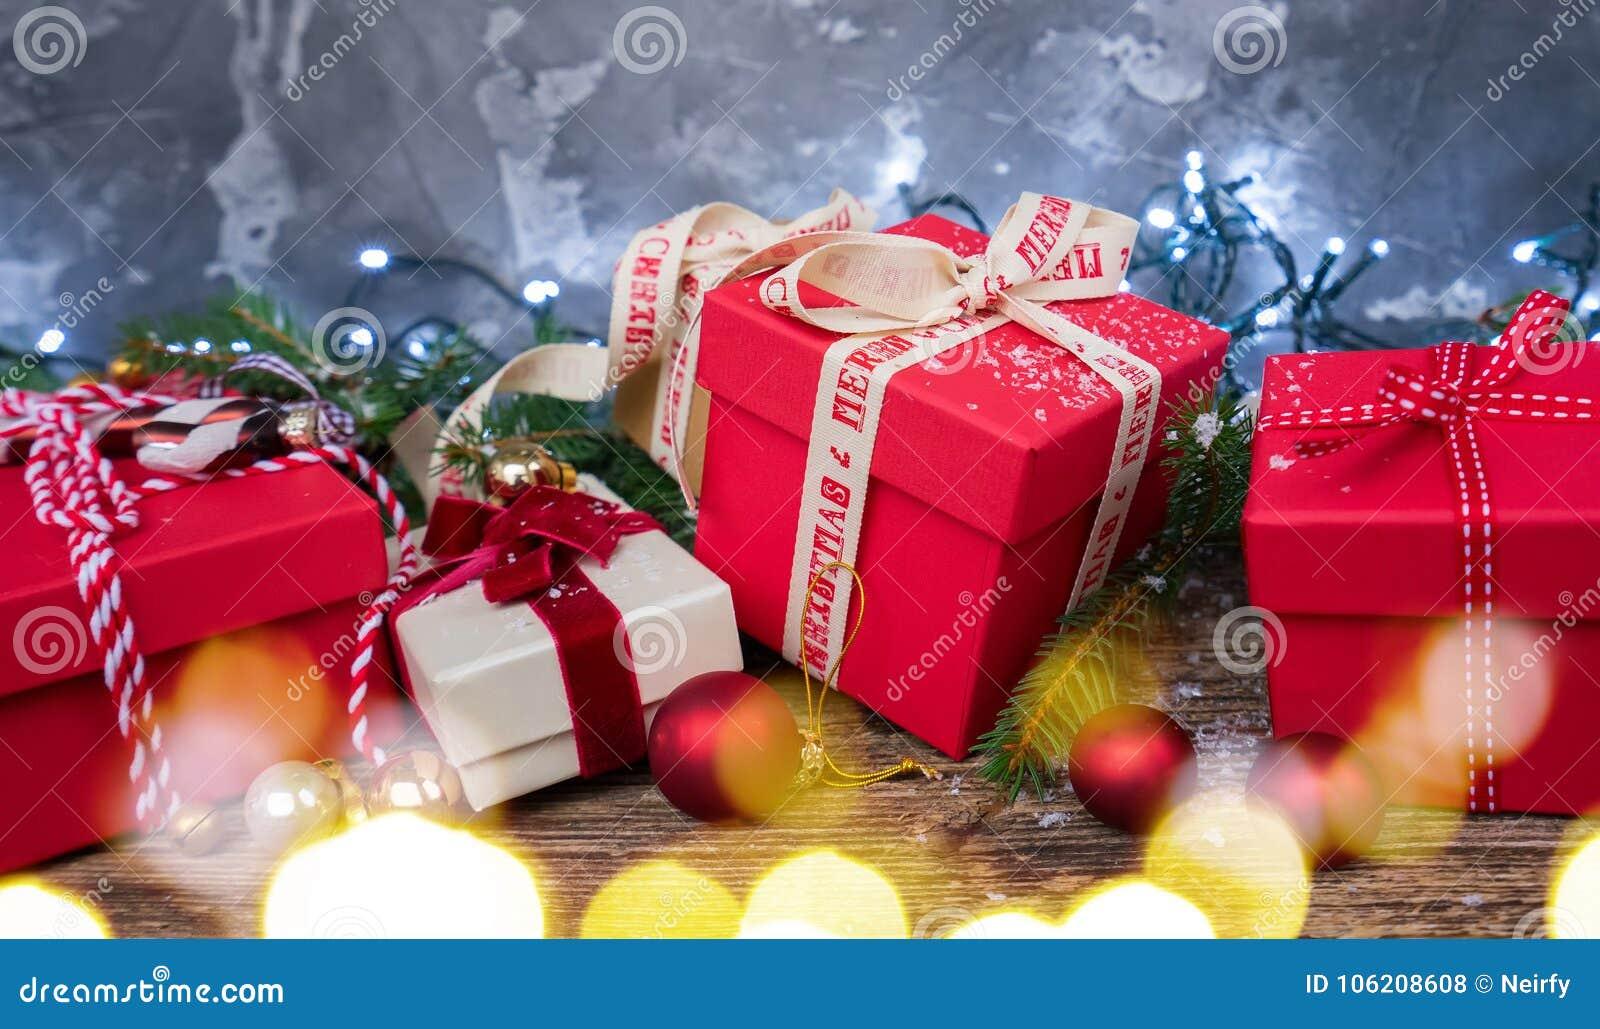 Christmas Gift Giving Images.Christmas Gift Giving Stock Photo Image Of Lights Snow